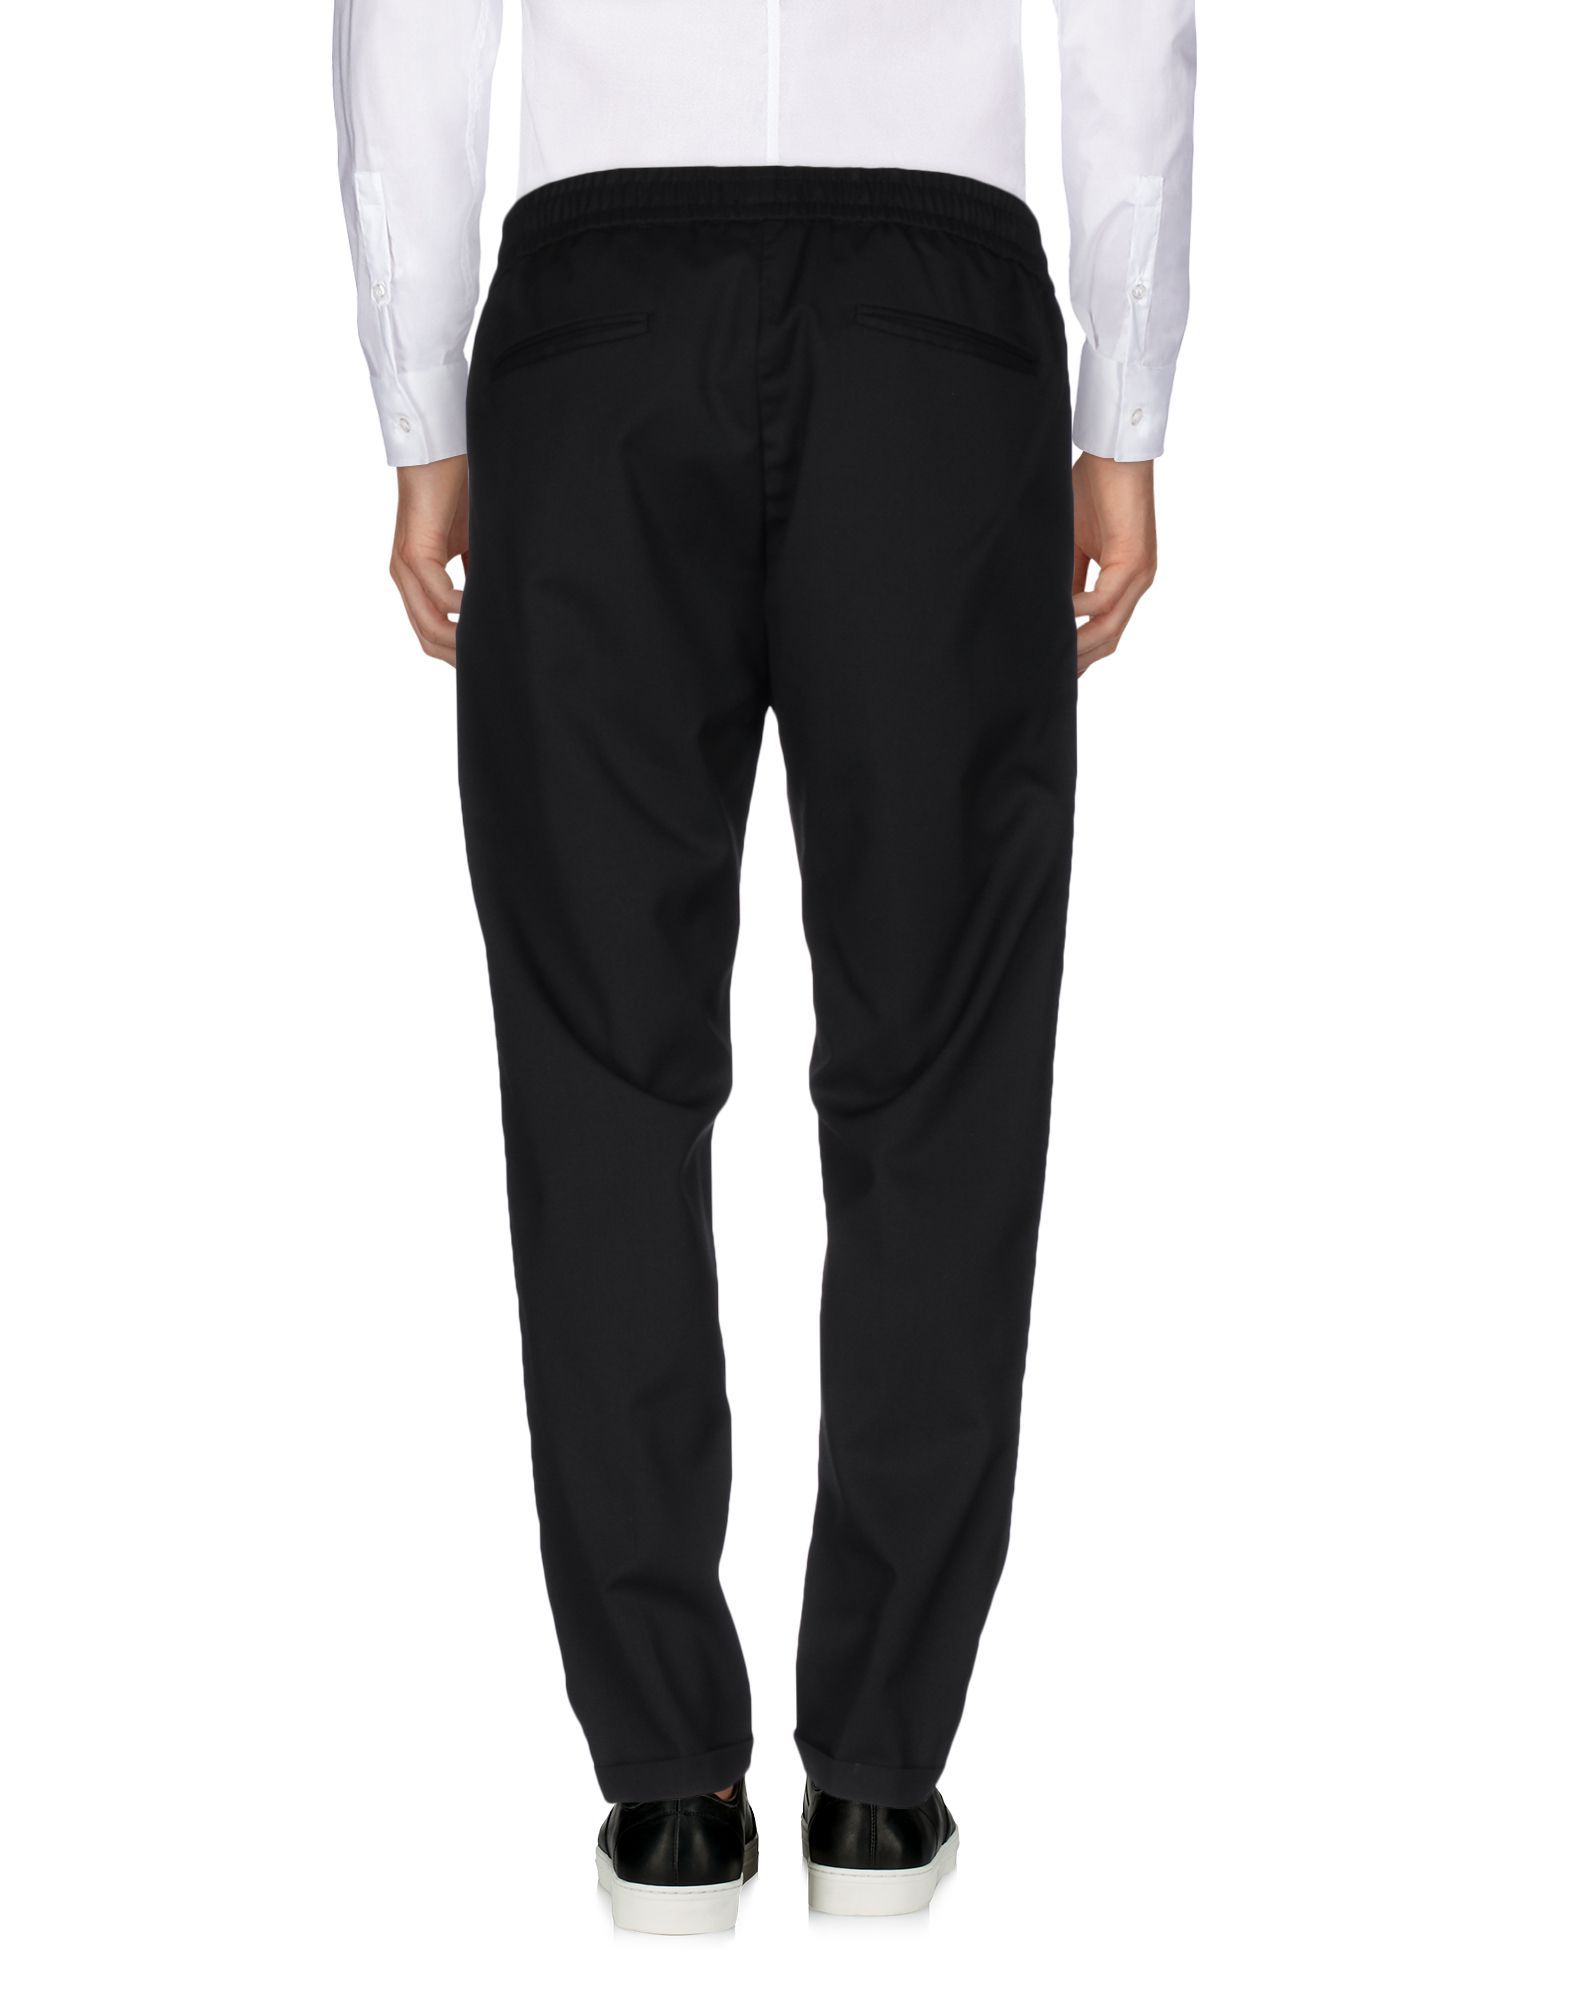 Pantalone - Selected Homme Uomo - Pantalone 36912590AJ 4f3212